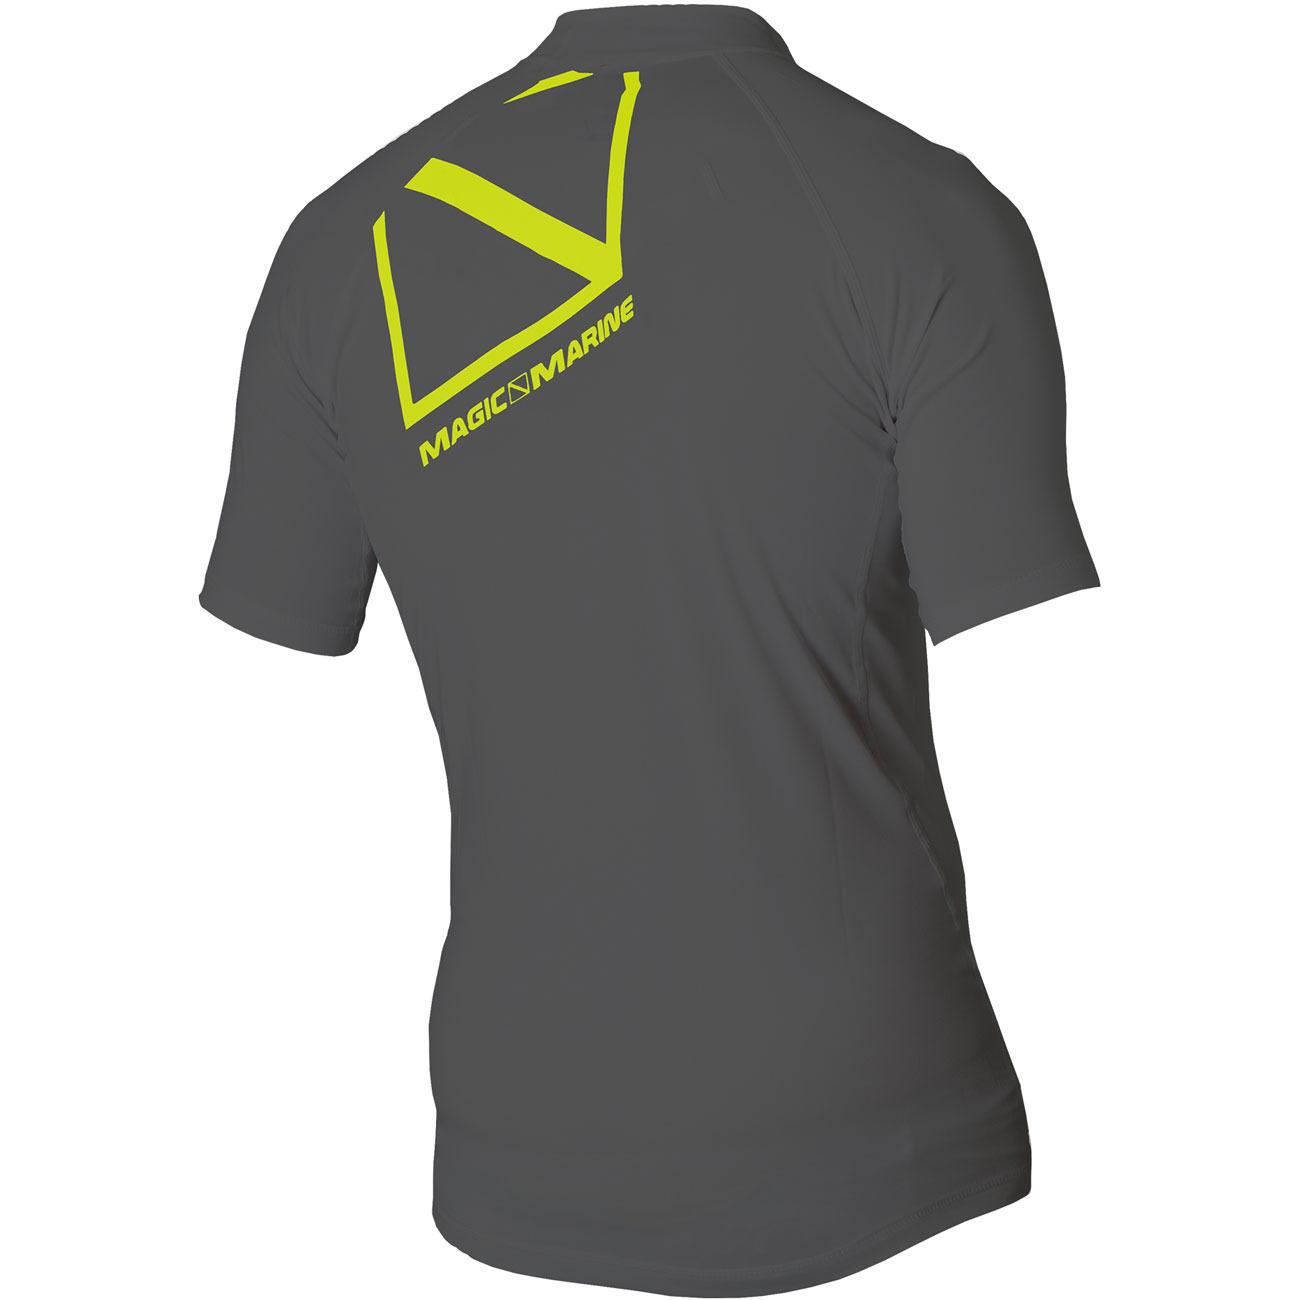 CUBE Rash Vest S/S ラッシュガード メンズ 半袖 UVカット